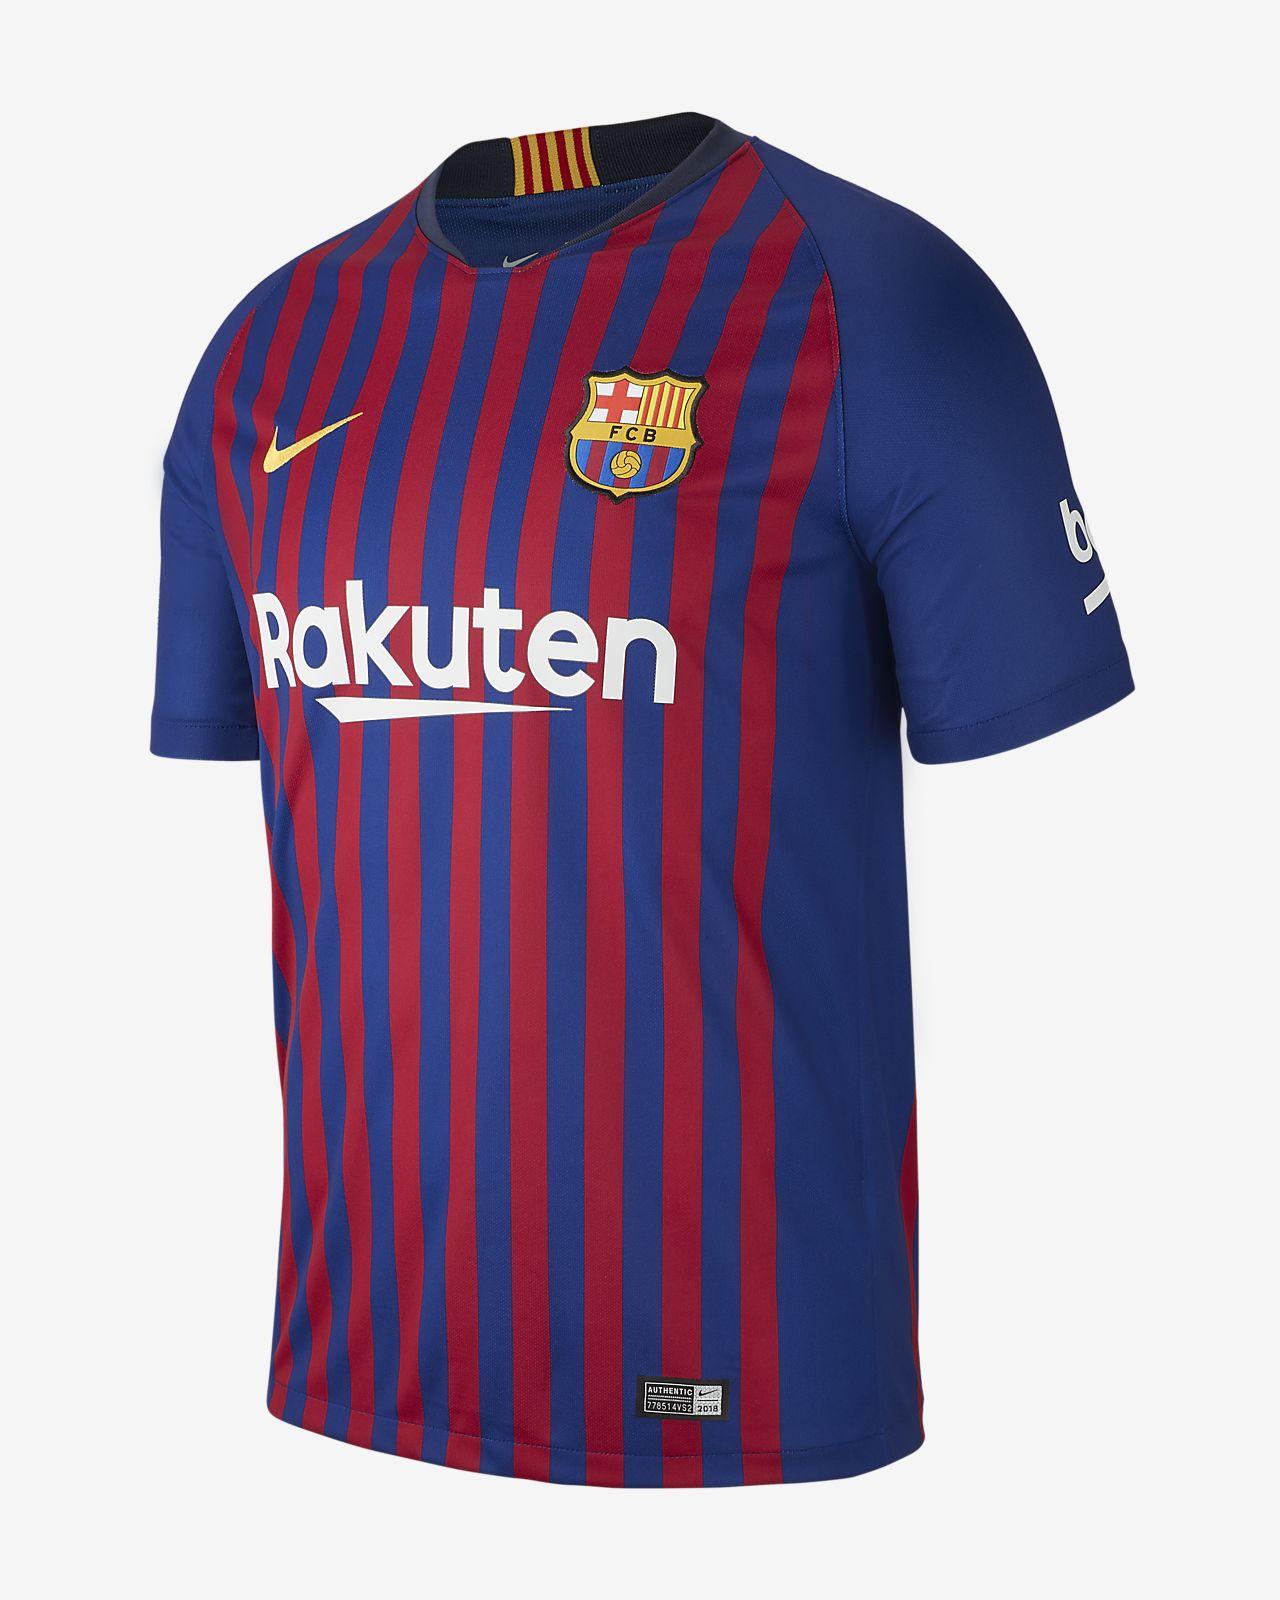 3feafed18f3 2018/19 FC Barcelona Stadium Home Men's Football Shirt. Nike.com MY